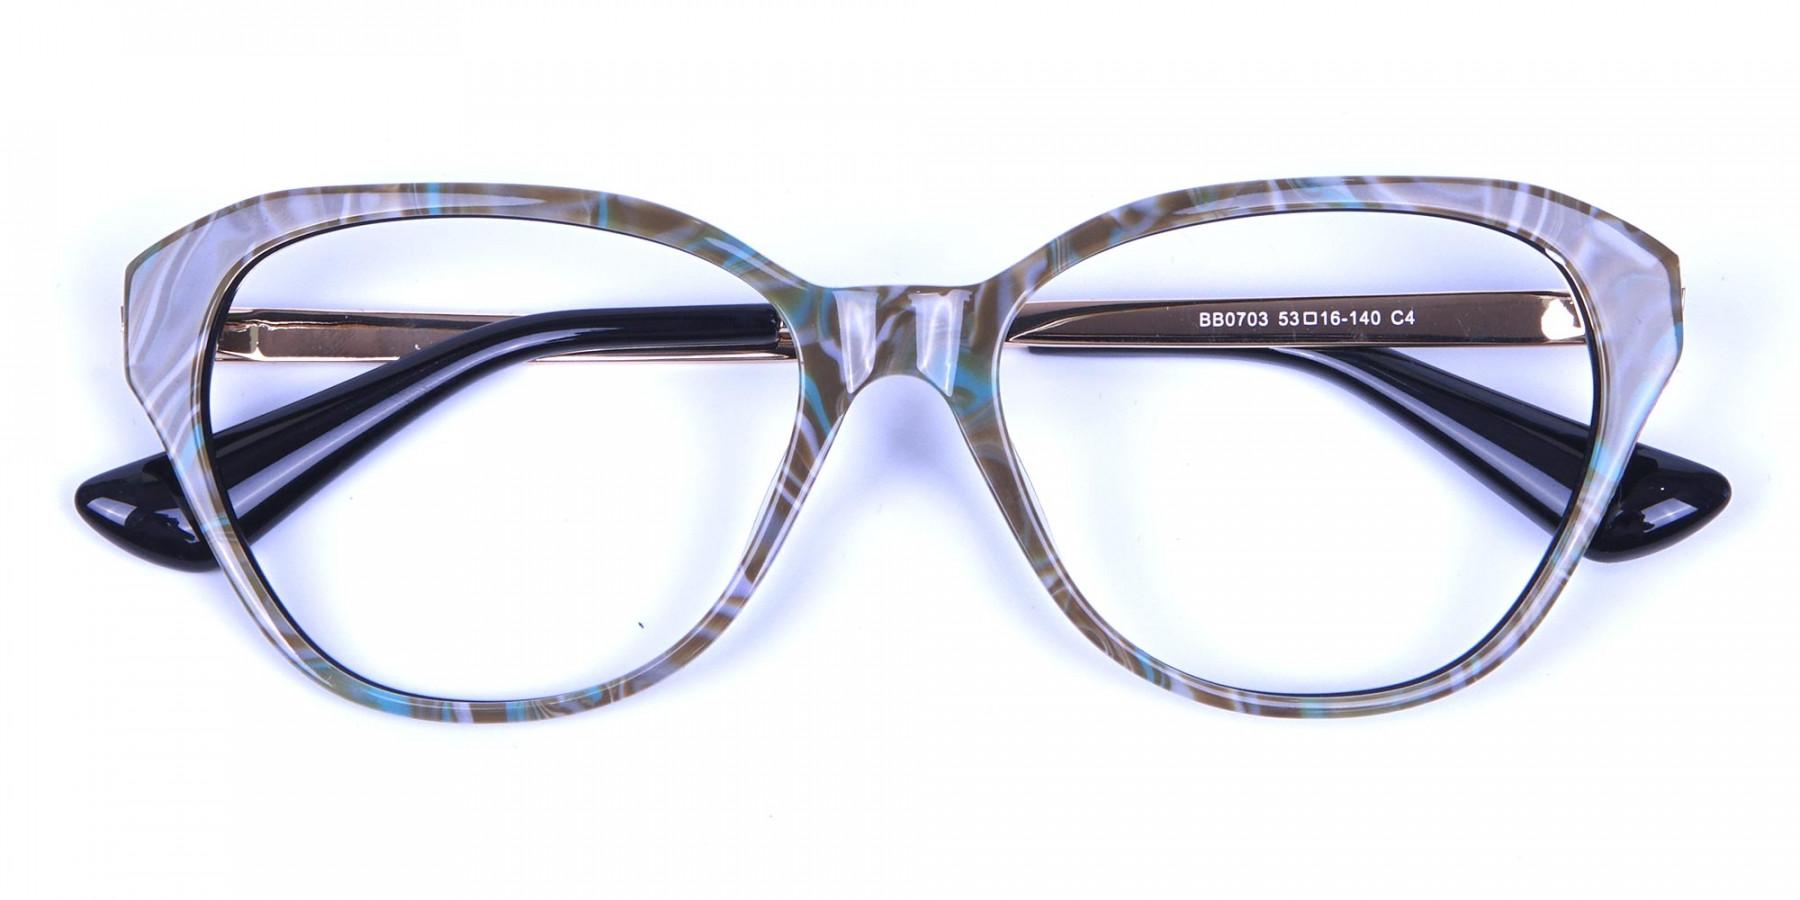 Jungle Green Glasses